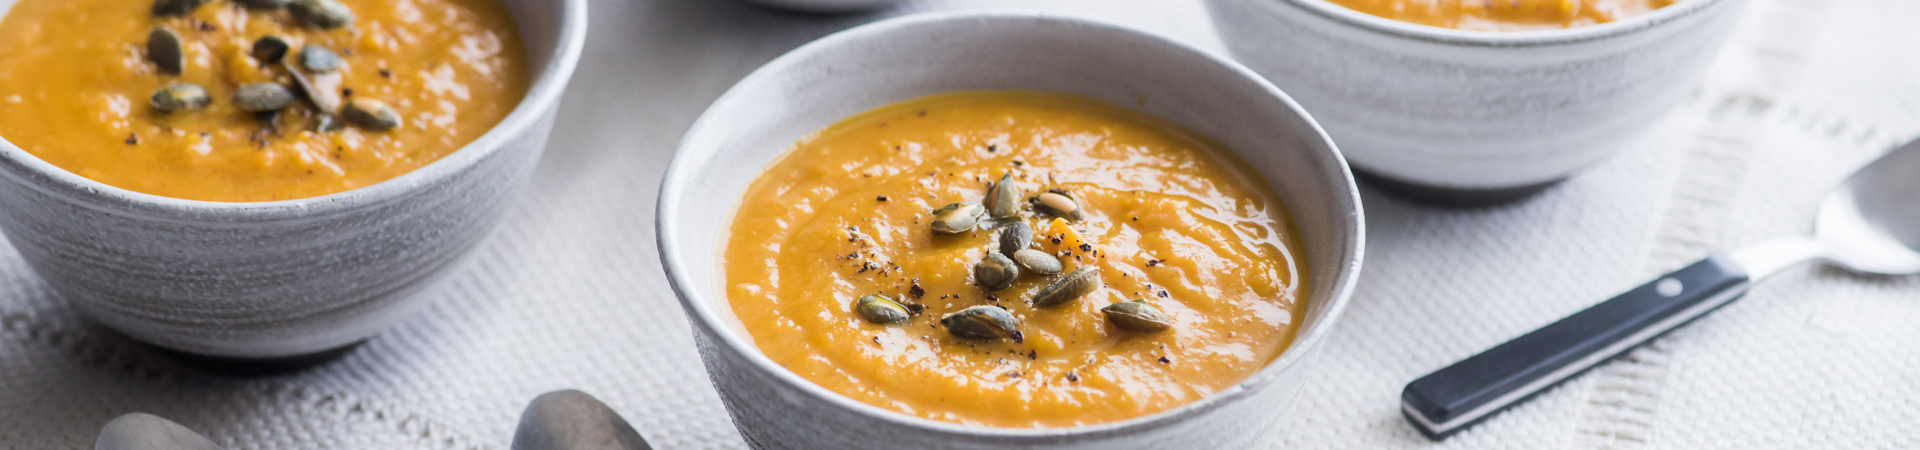 Creamy Pumpkin Curry Soup